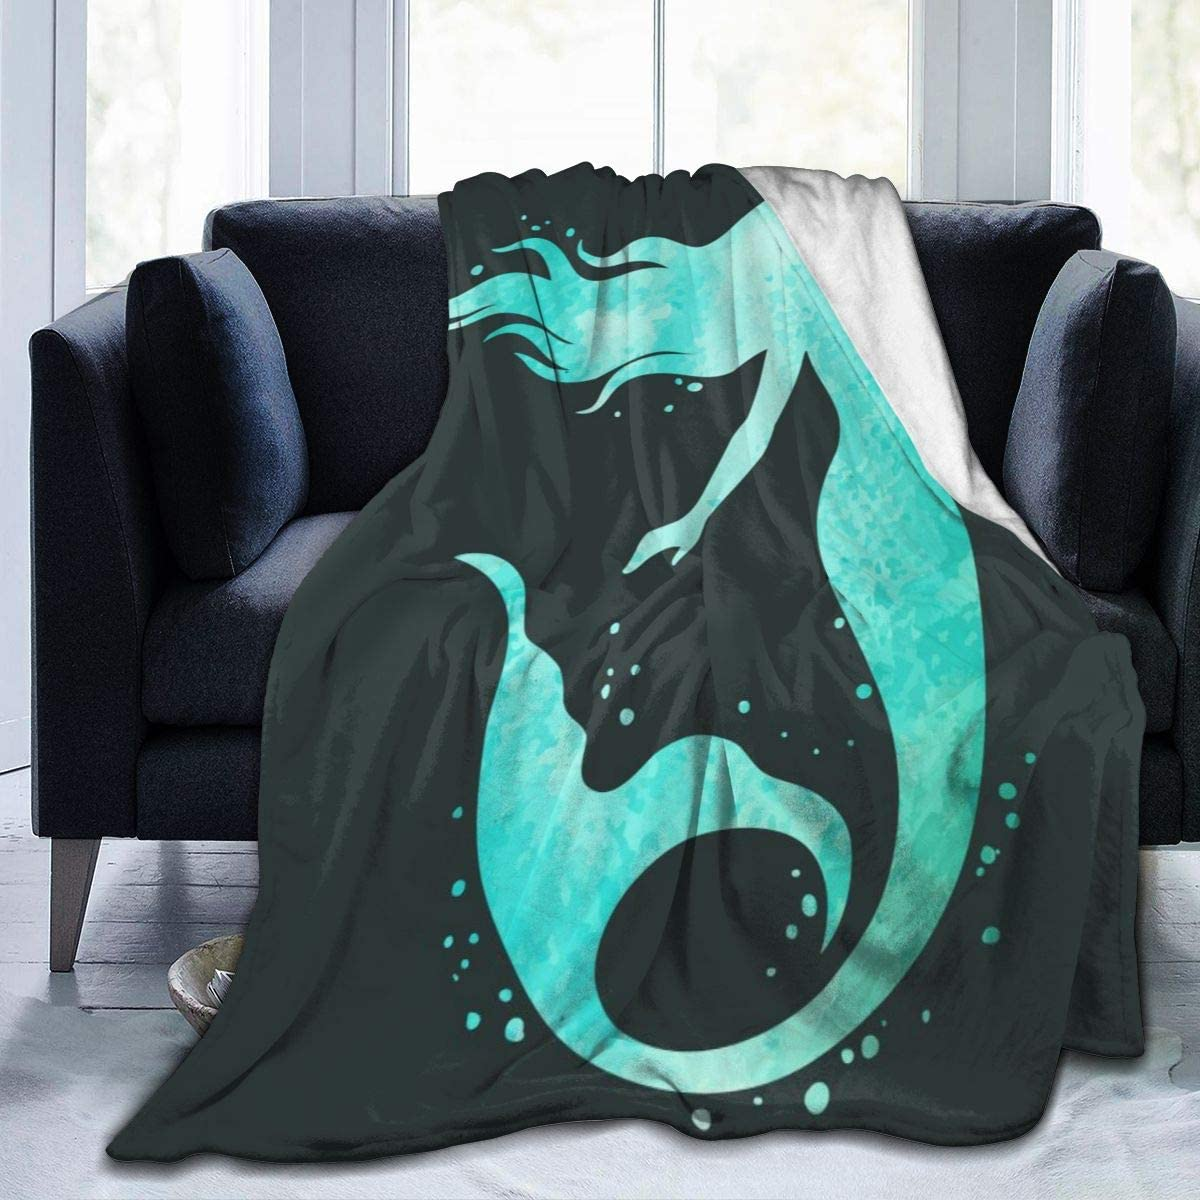 ANNE STOKES Cool Awesome Polar Fleece Throw Blanket Rug 127 x 152 cm